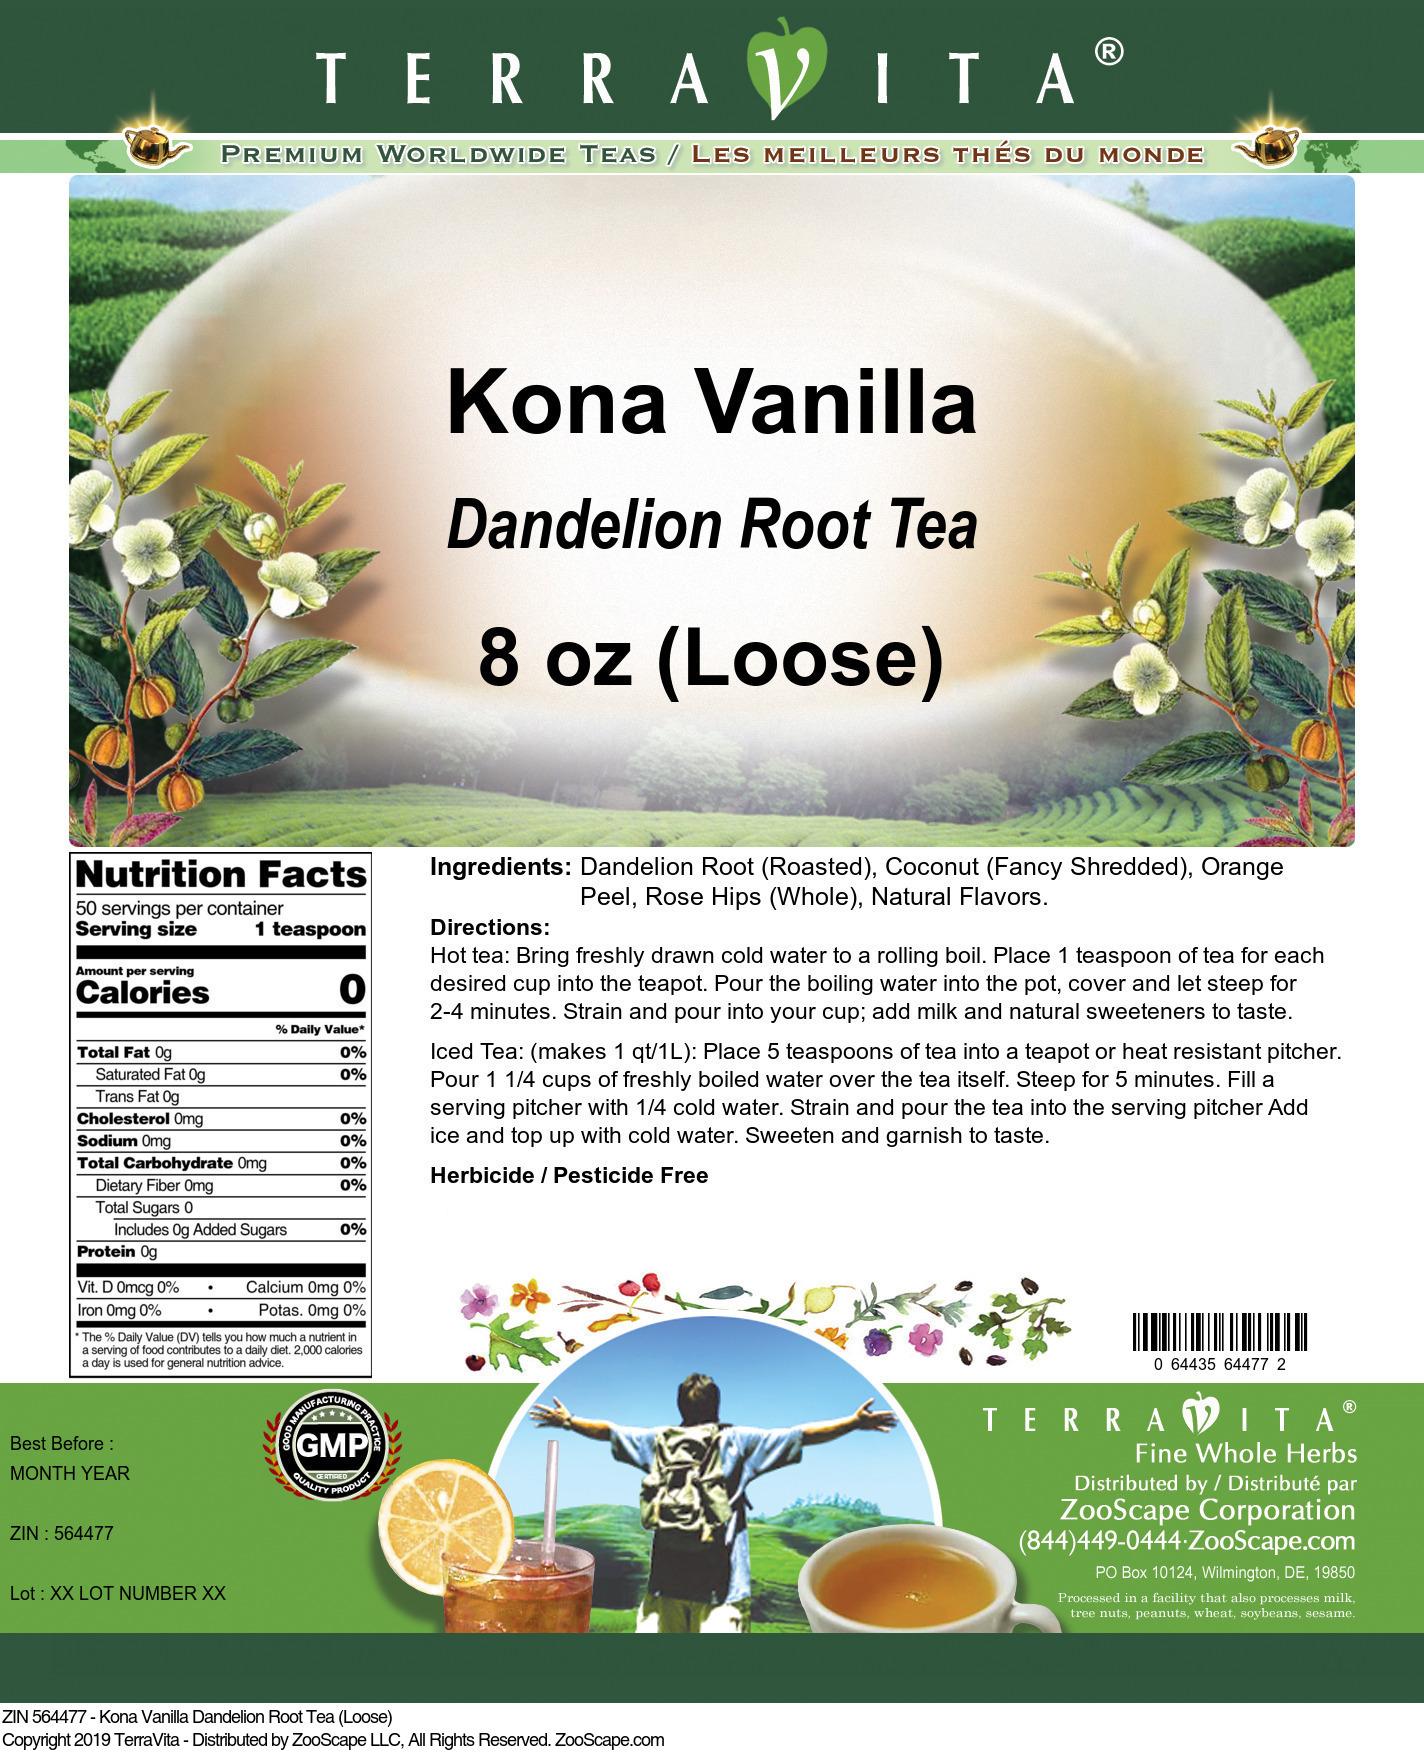 Kona Vanilla Dandelion Root